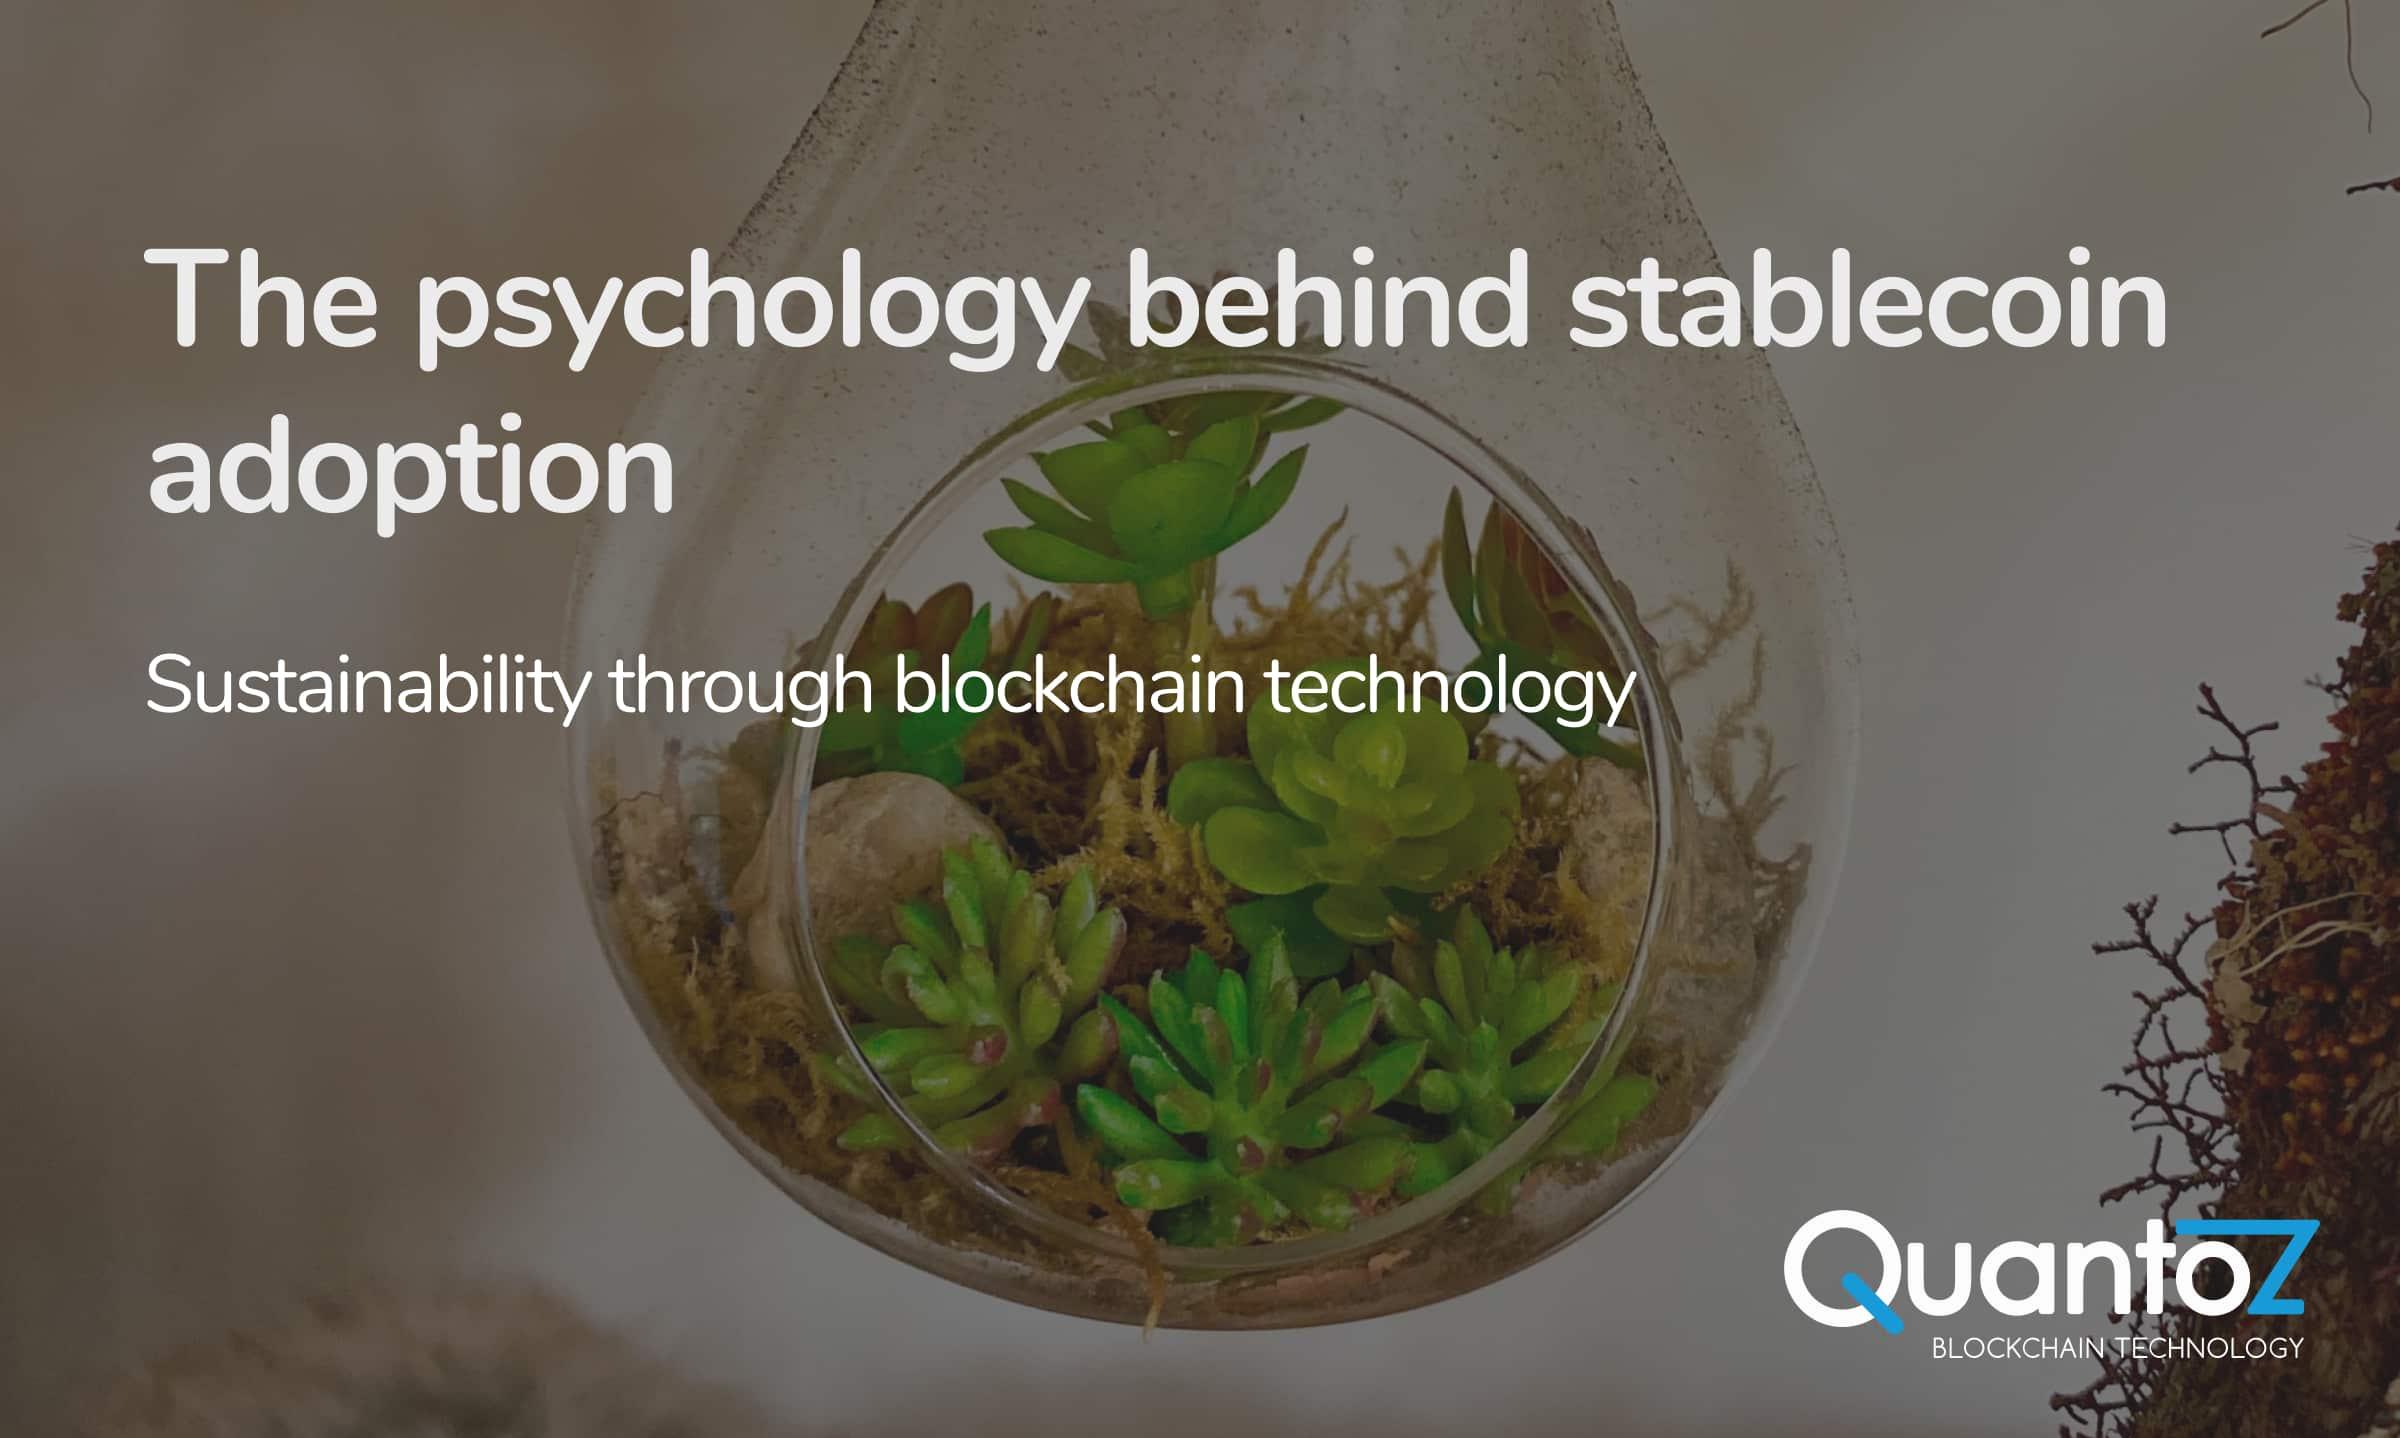 Stablecoin adoption